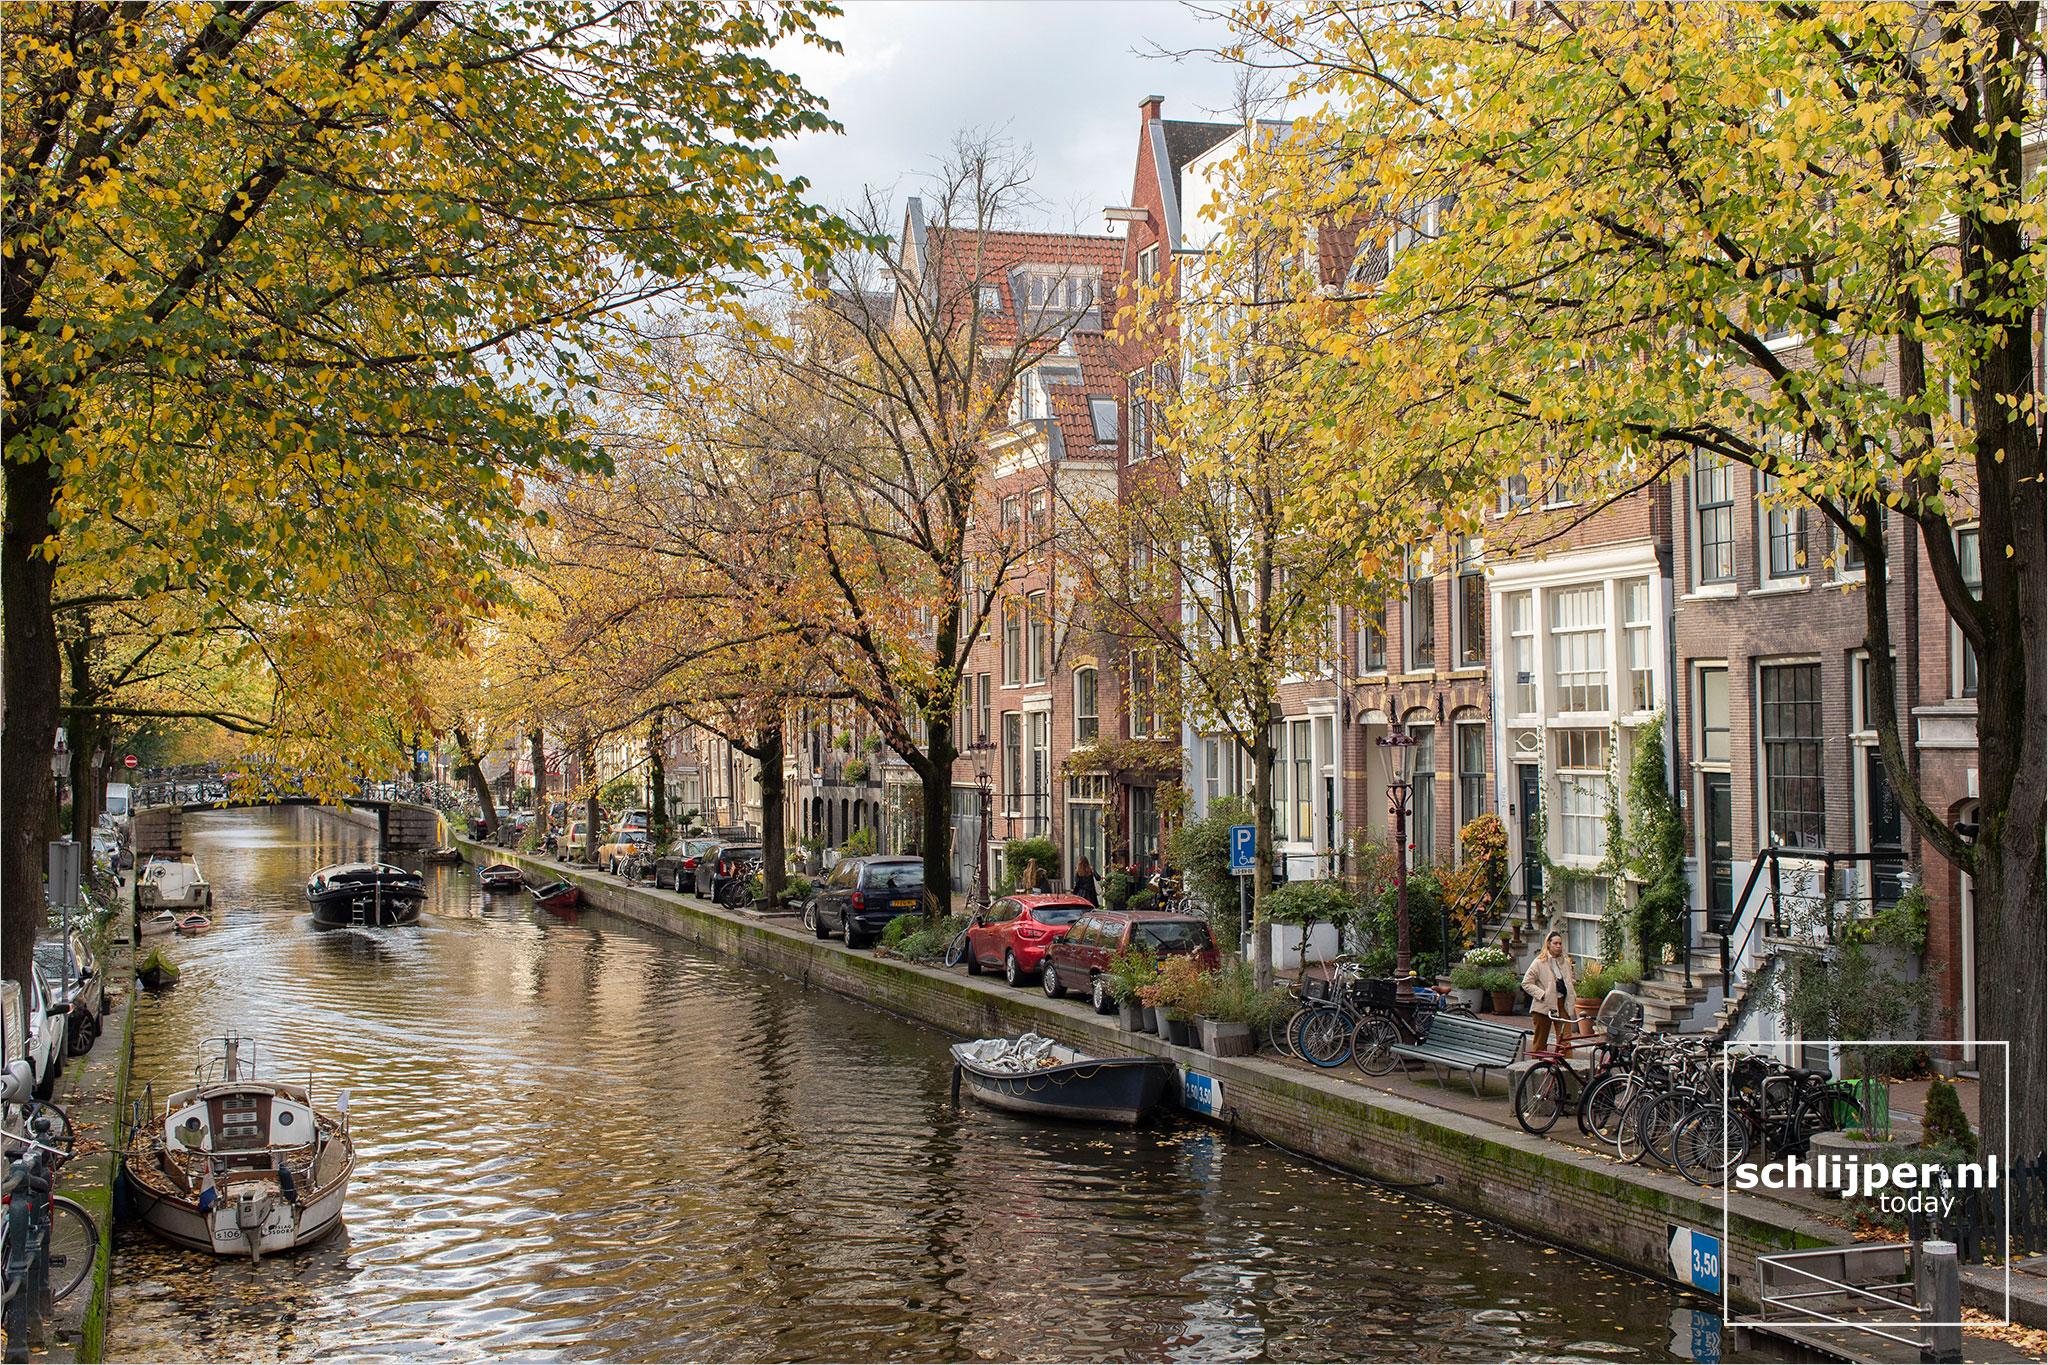 Nederland, Amsterdam, 31 oktober 2020